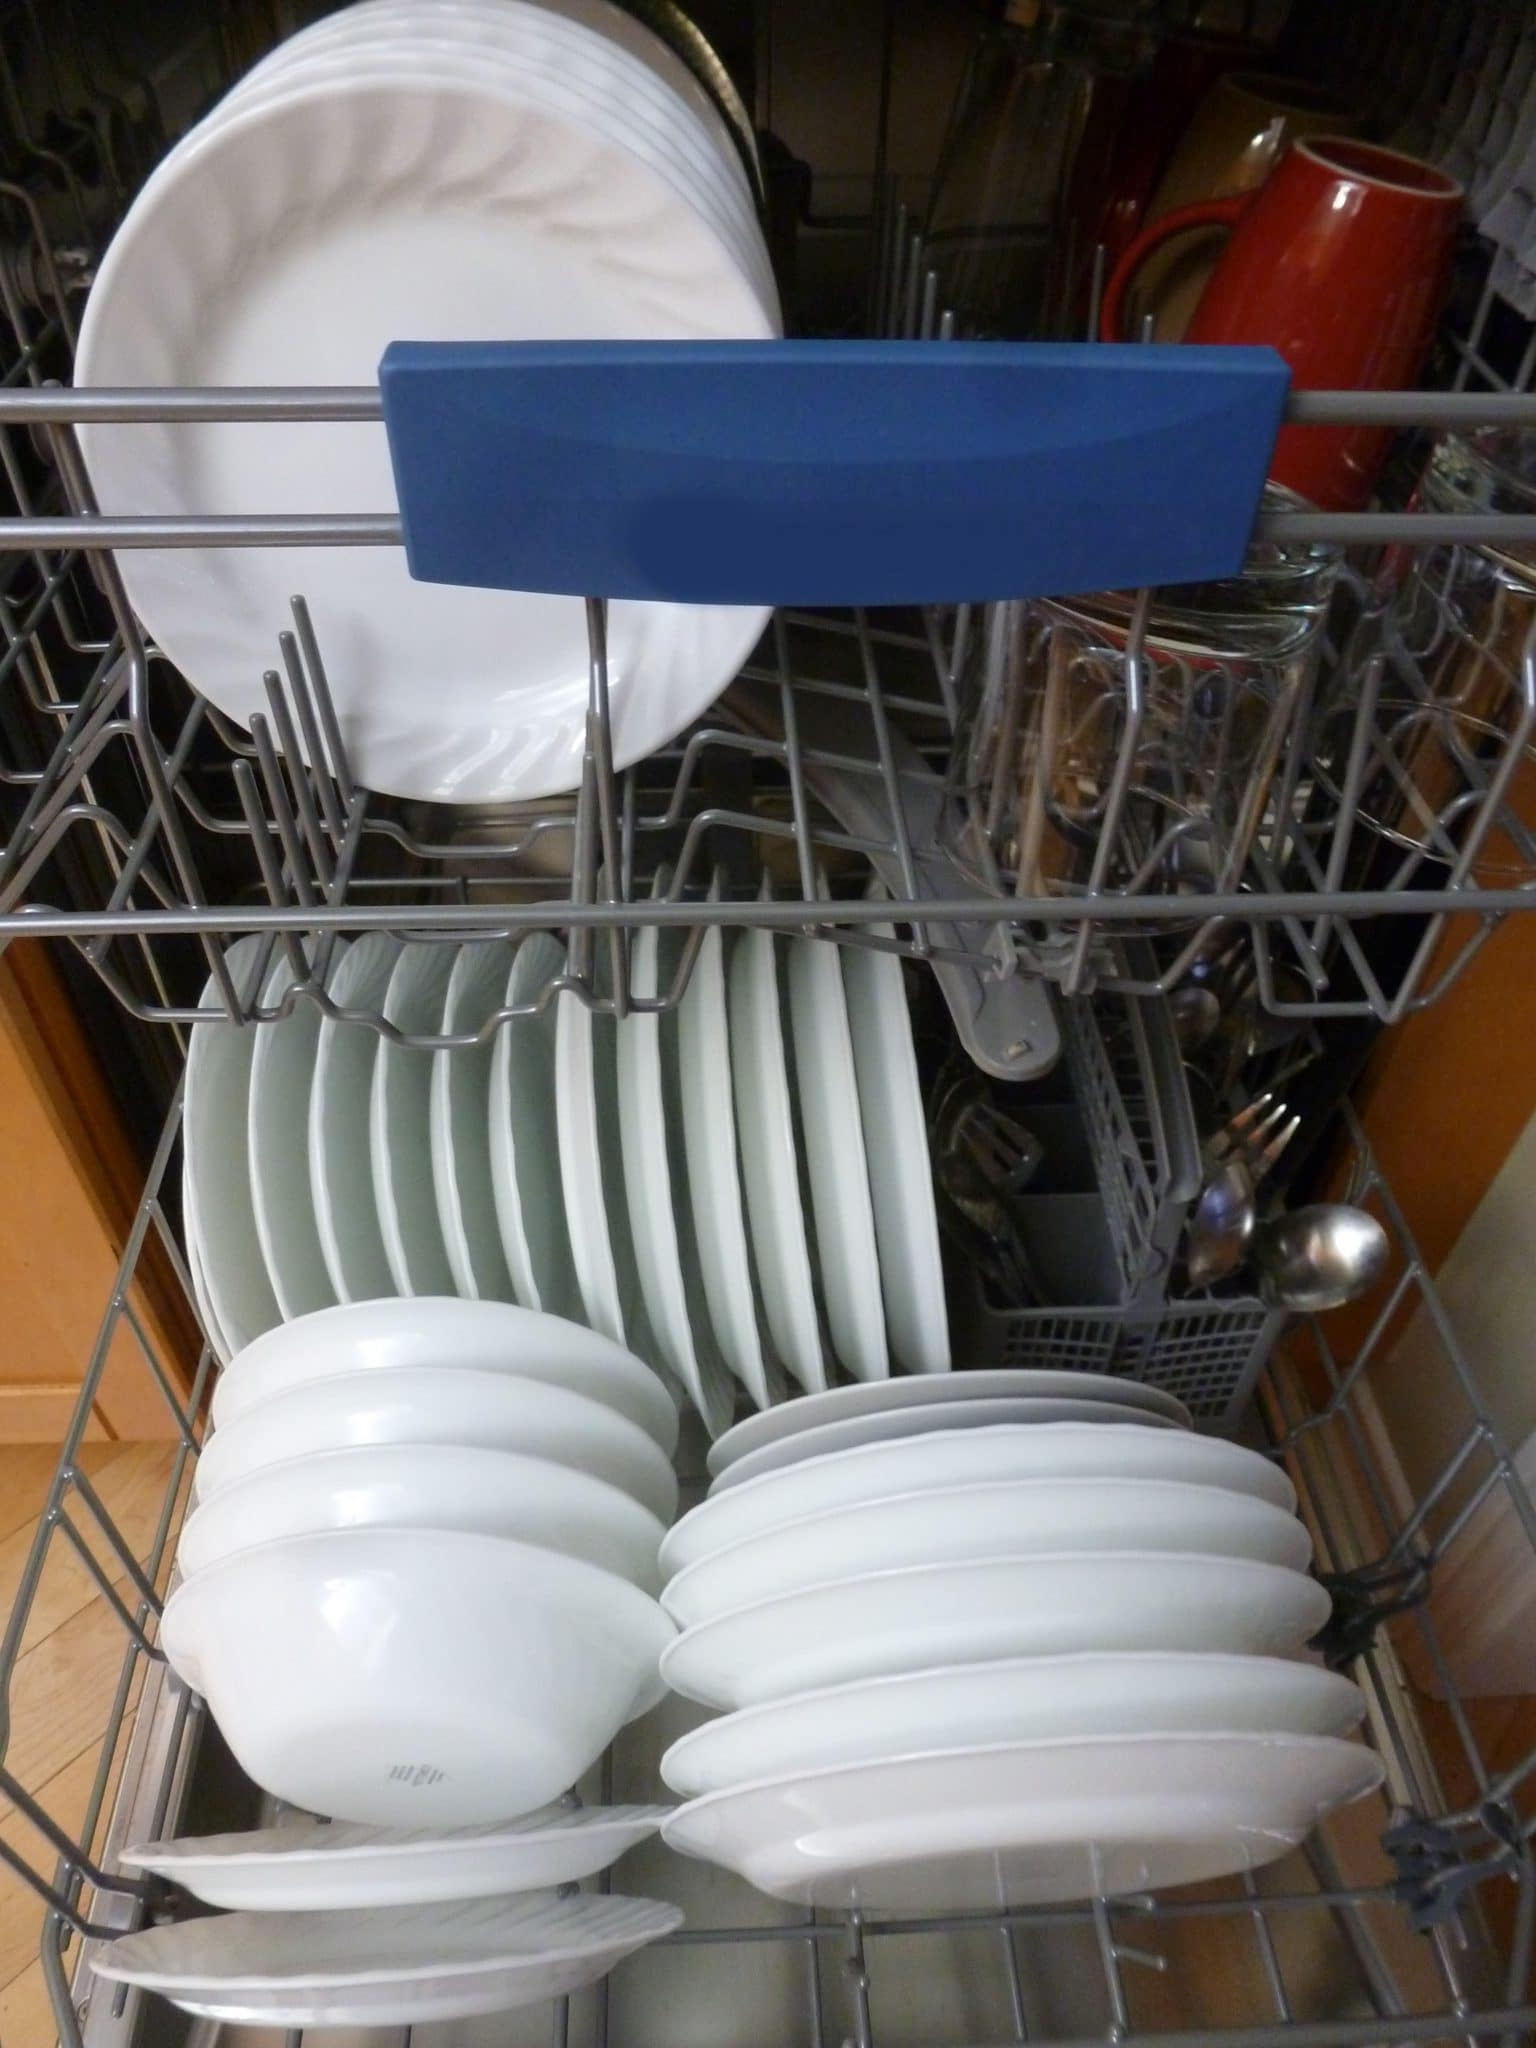 automatic dish washing machine, countertop kitchen appliances